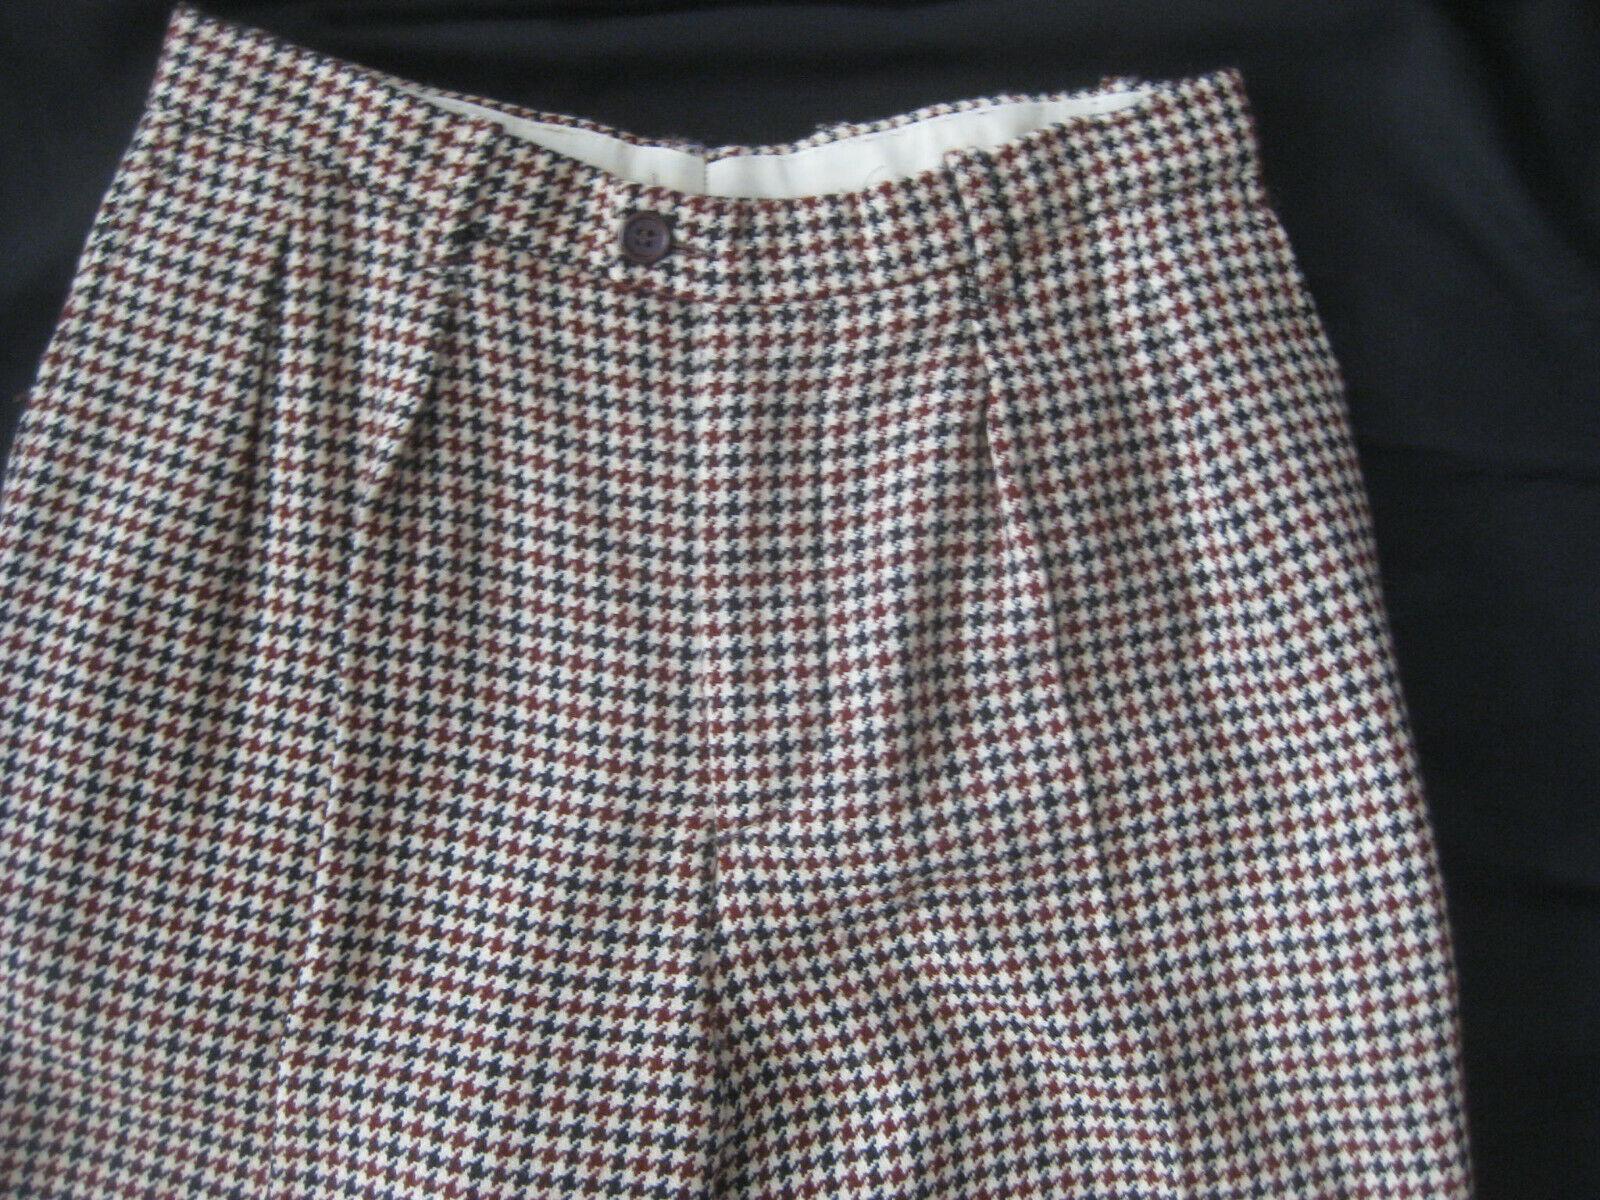 1980s KENZO Paris Wool HOUNDSTOOTH PLAID Pleat Fr… - image 2